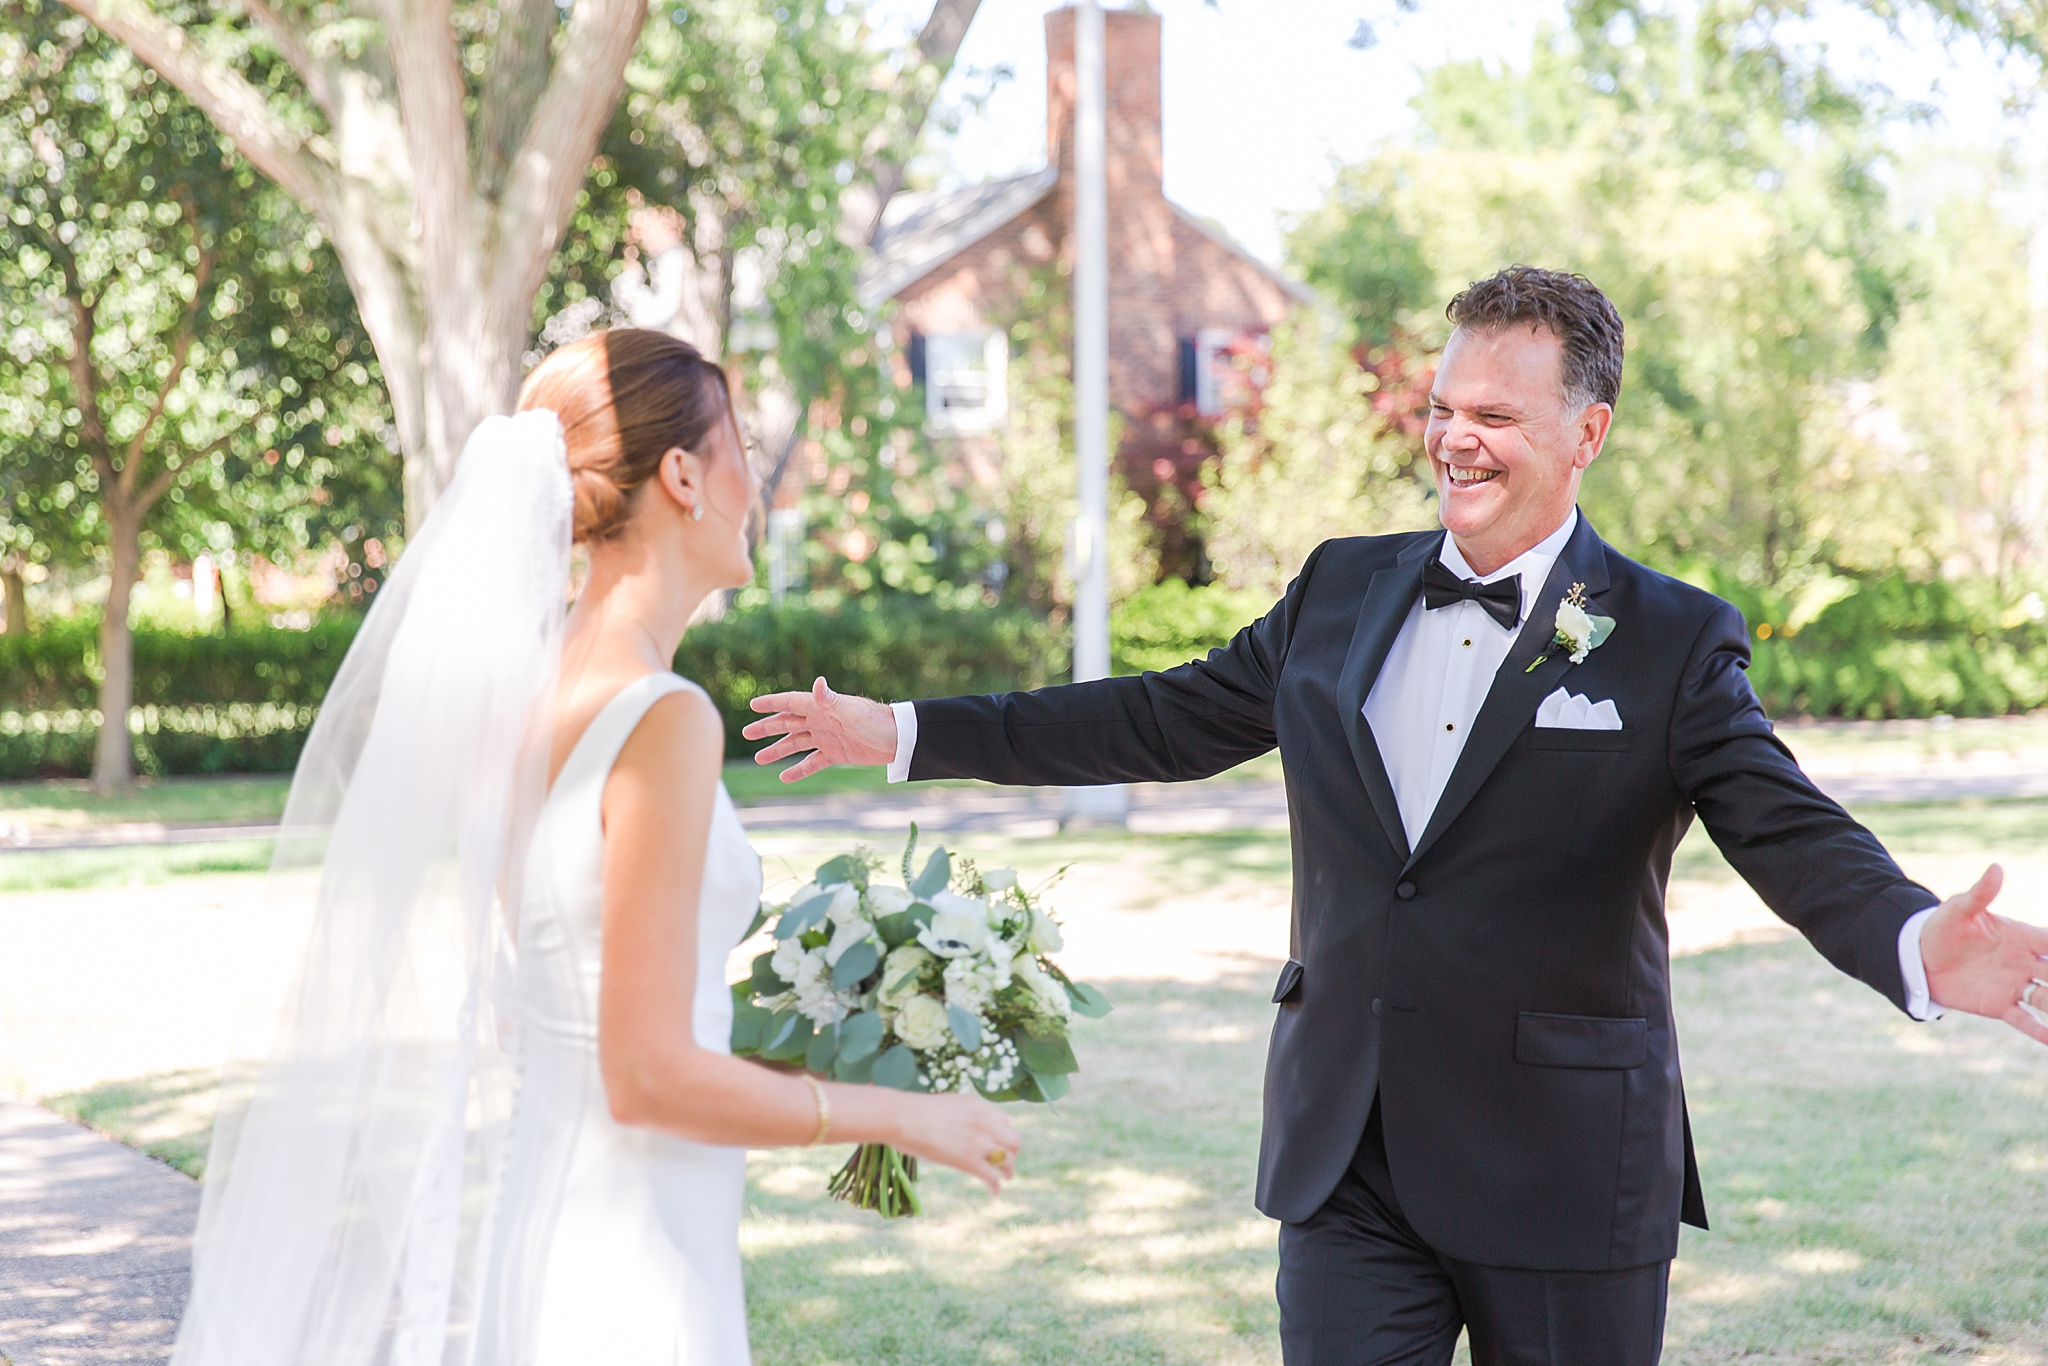 detroit-wedding-photographer-grosse-pointe-academy-chapel-detroit-golf-club-wedding-carly-matt-by-courtney-carolyn-photography_0022.jpg